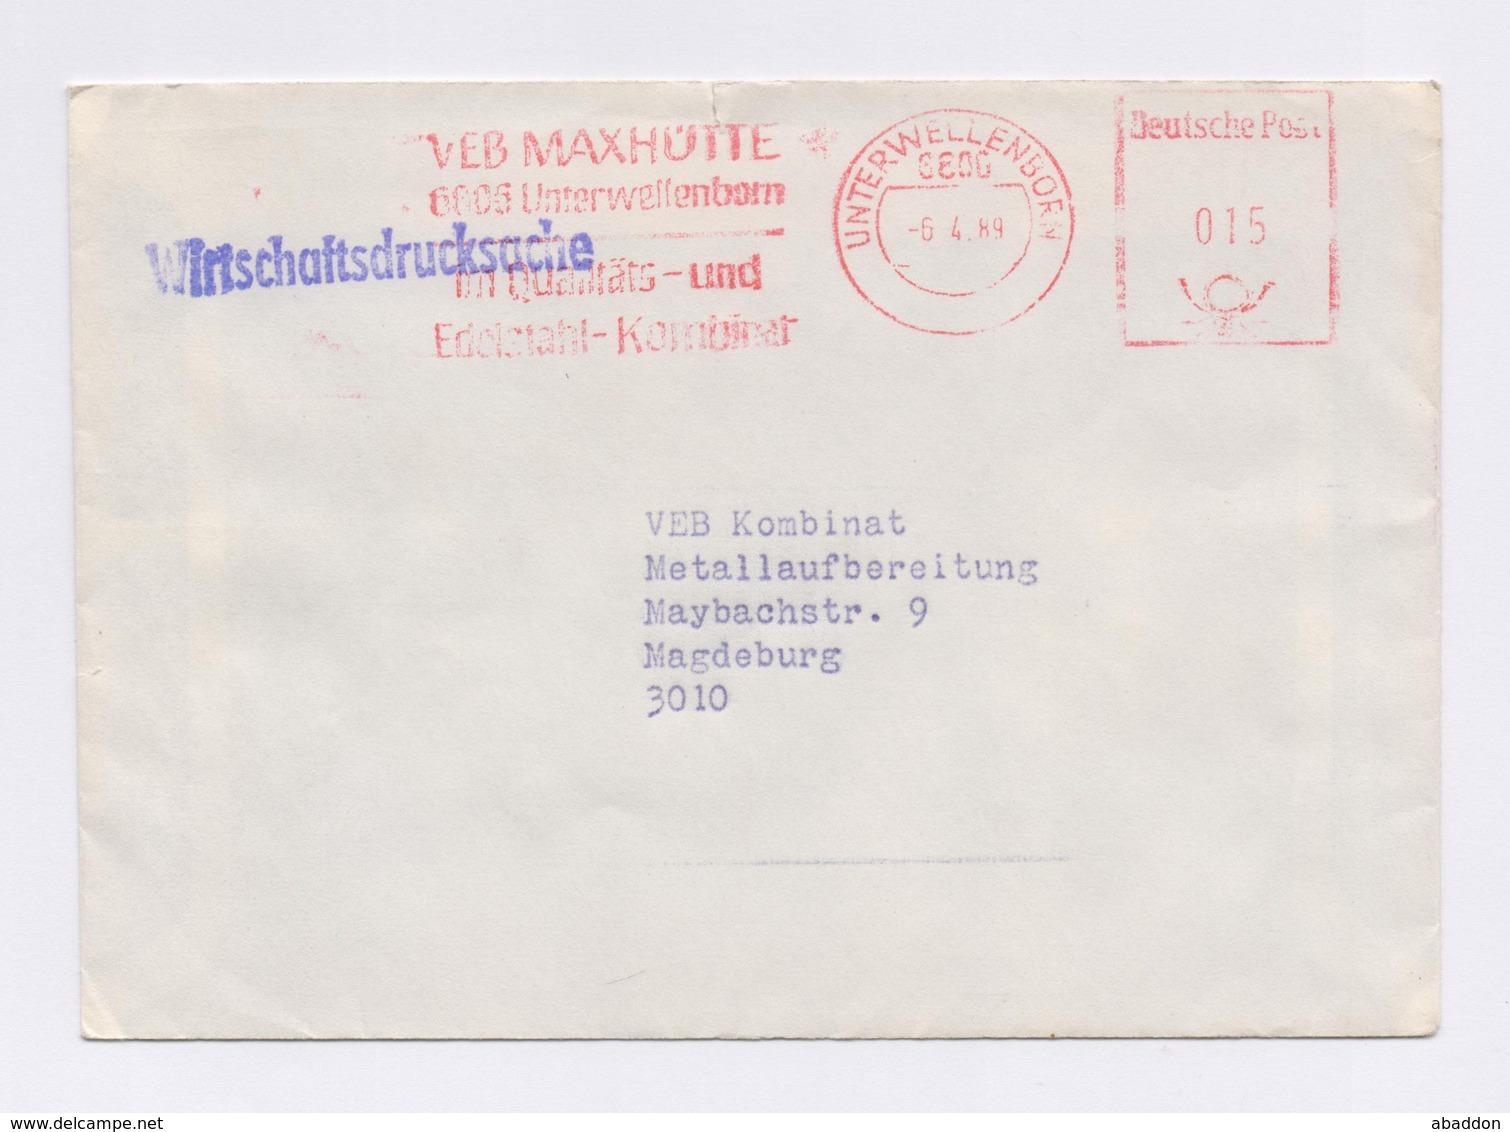 DDR AFS - UNTERWELLENBORN, VEB Maxhütte -6.4.89 - DDR